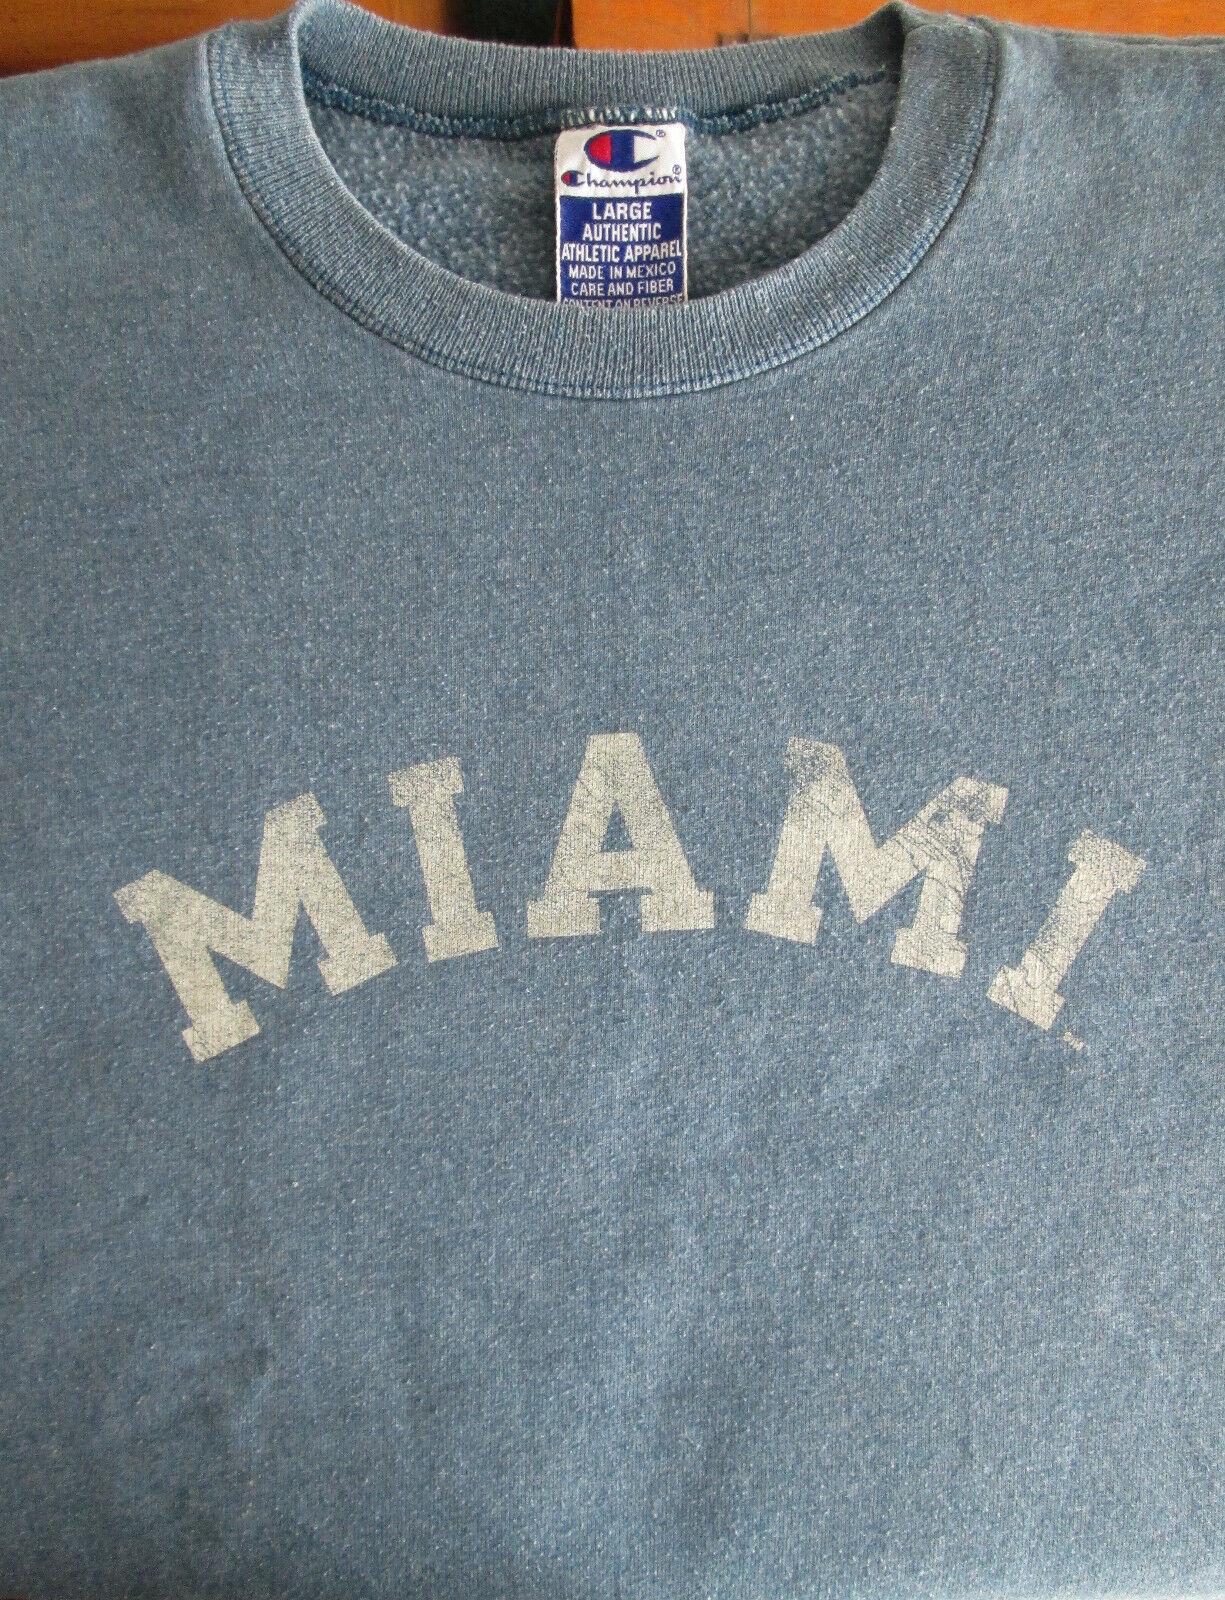 Miami Retro Faded Graphic Blue Sweatshirt Cotton Blend Size Large Champion image 3